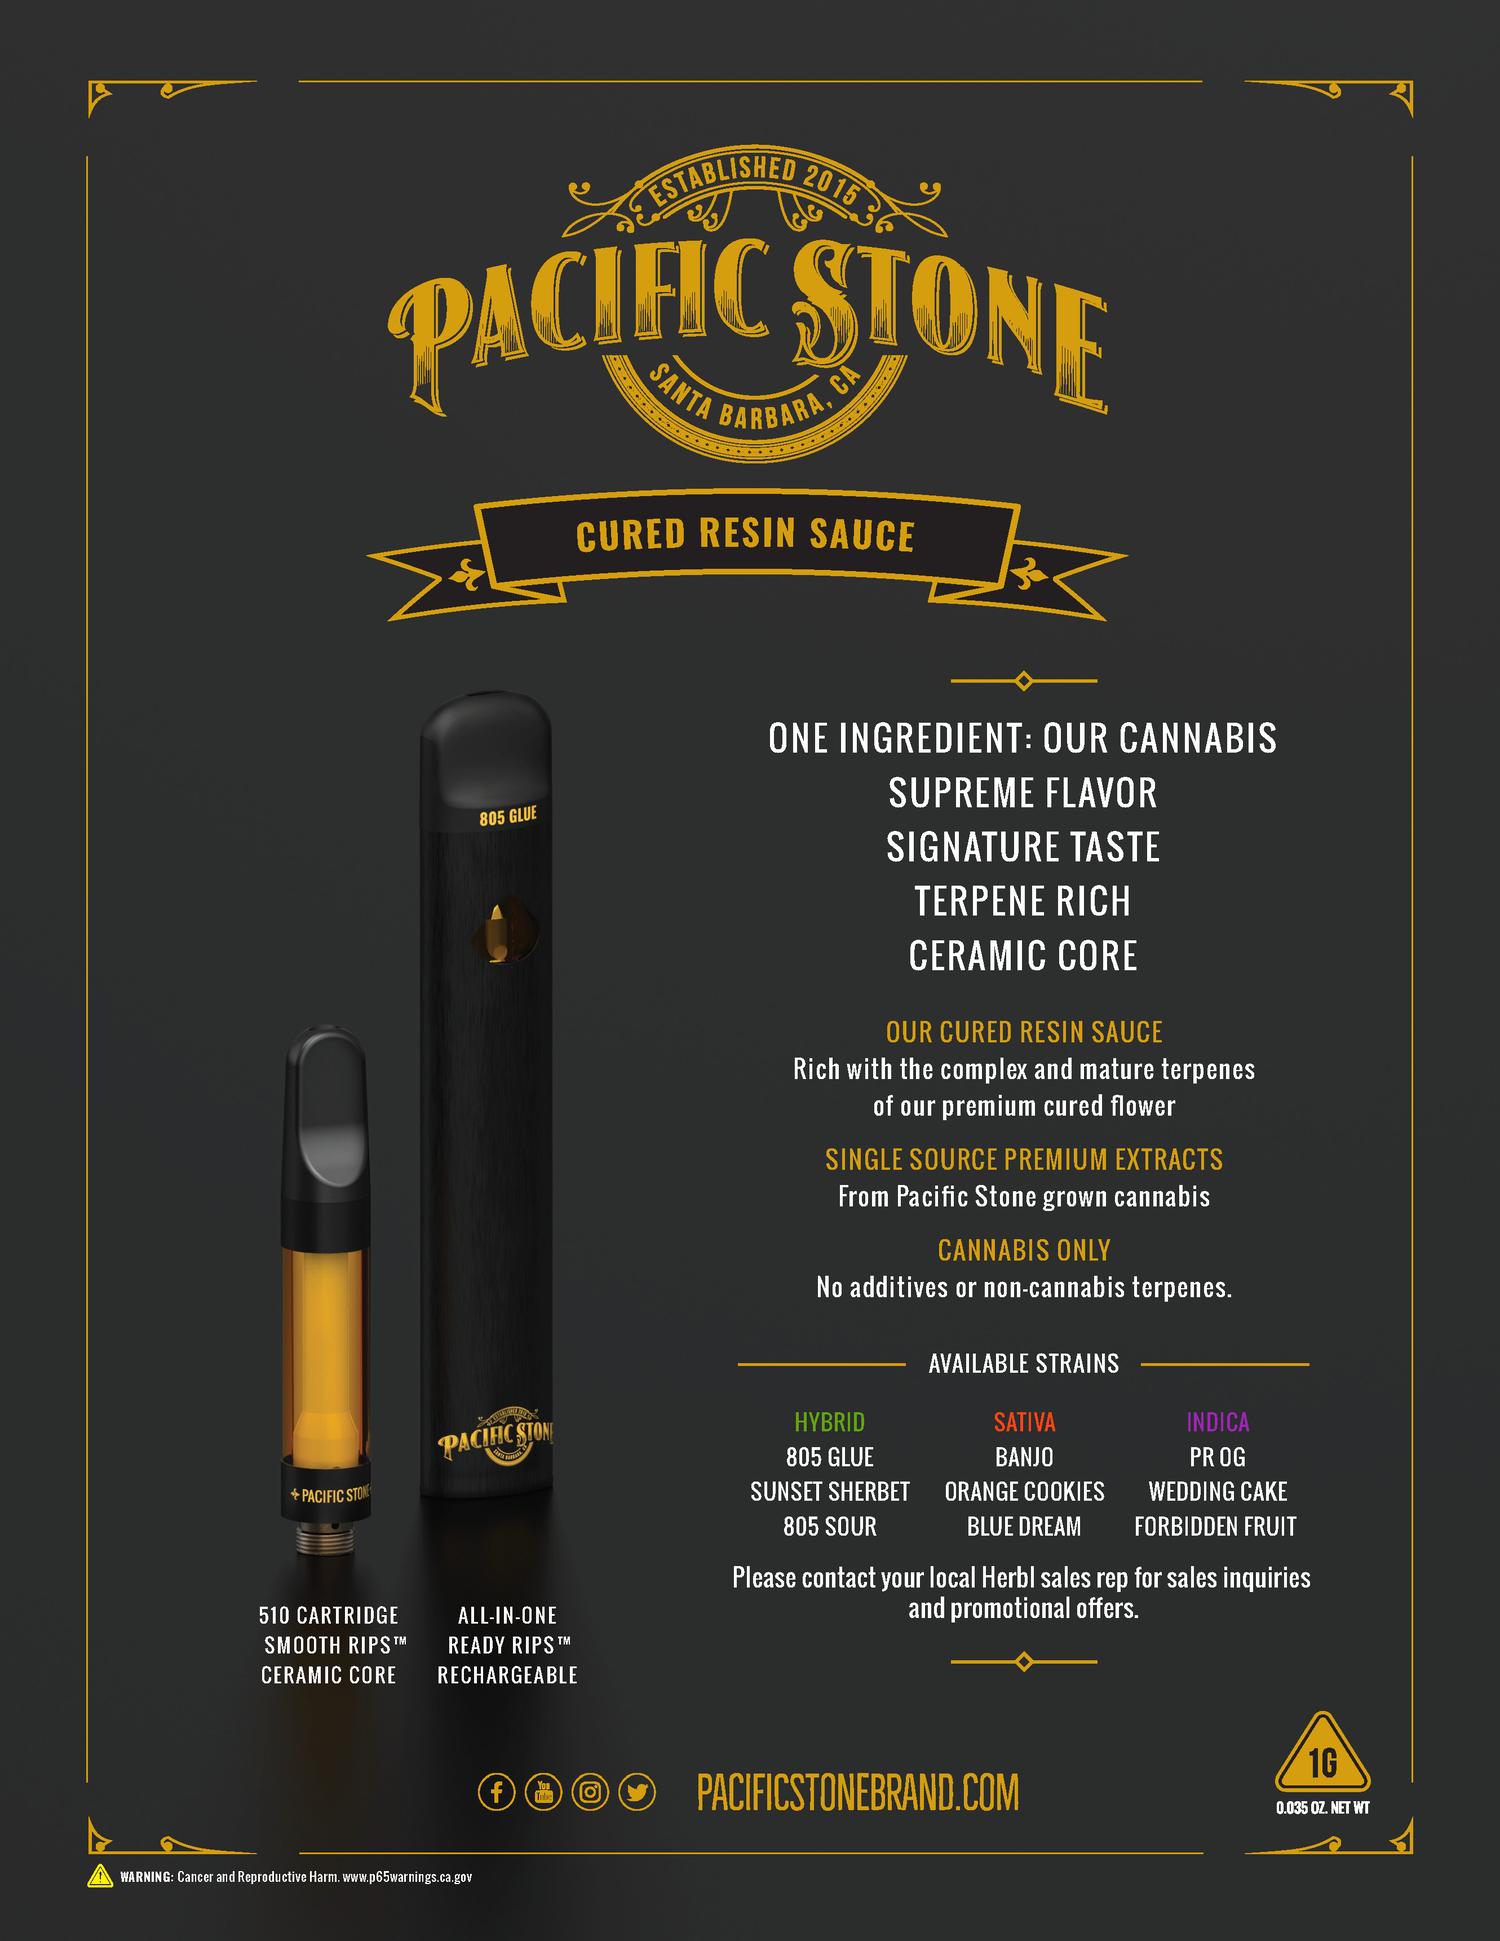 PacificStone-1G-CuredResinVaporizers (003).png